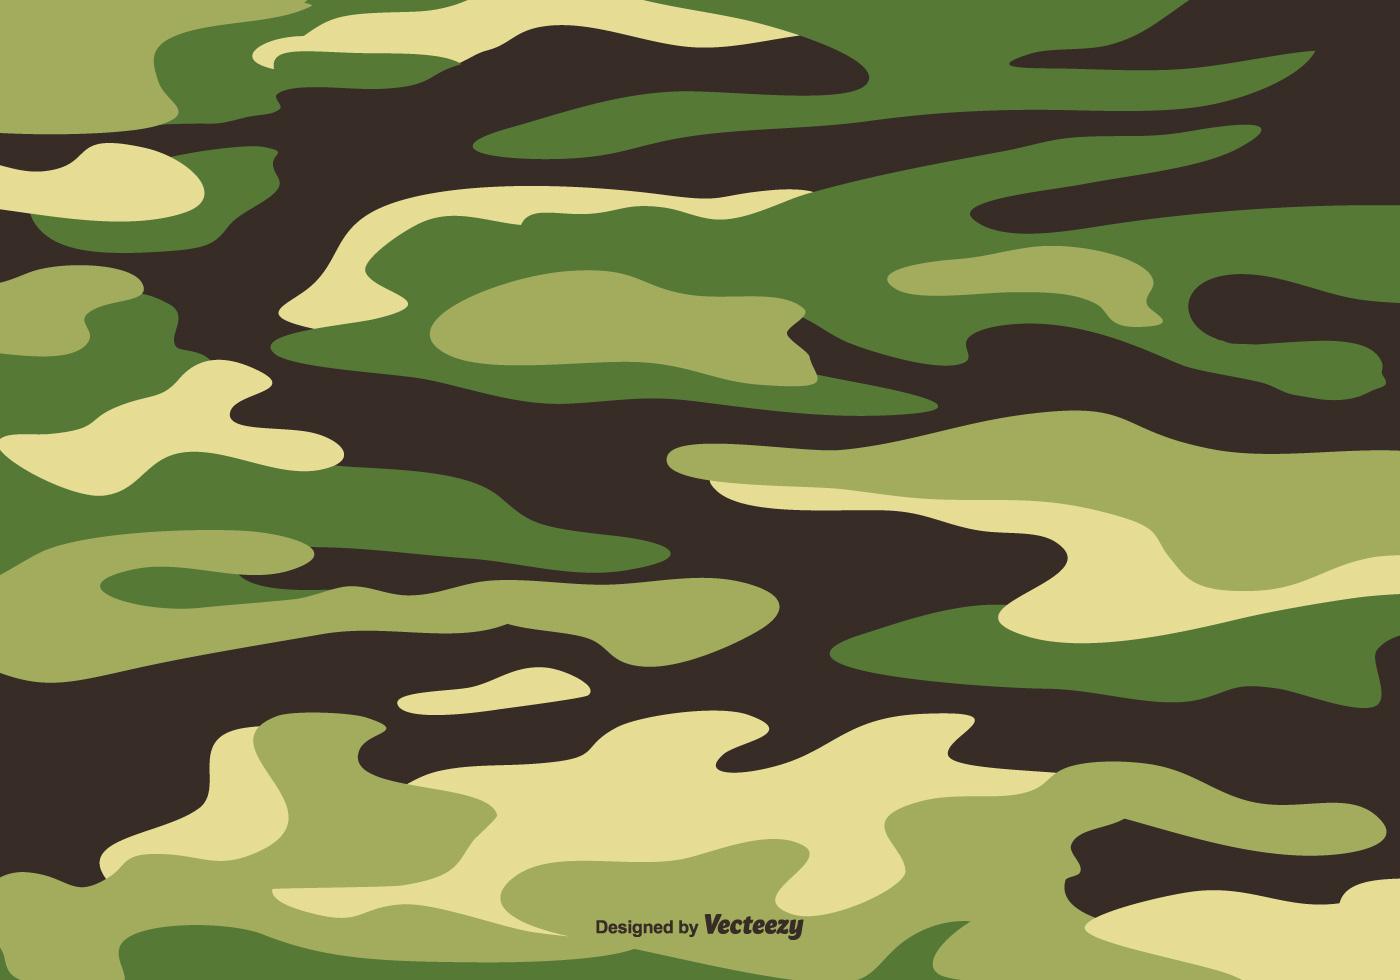 Forest Multicam Pattern Vector Background - Download Free ...